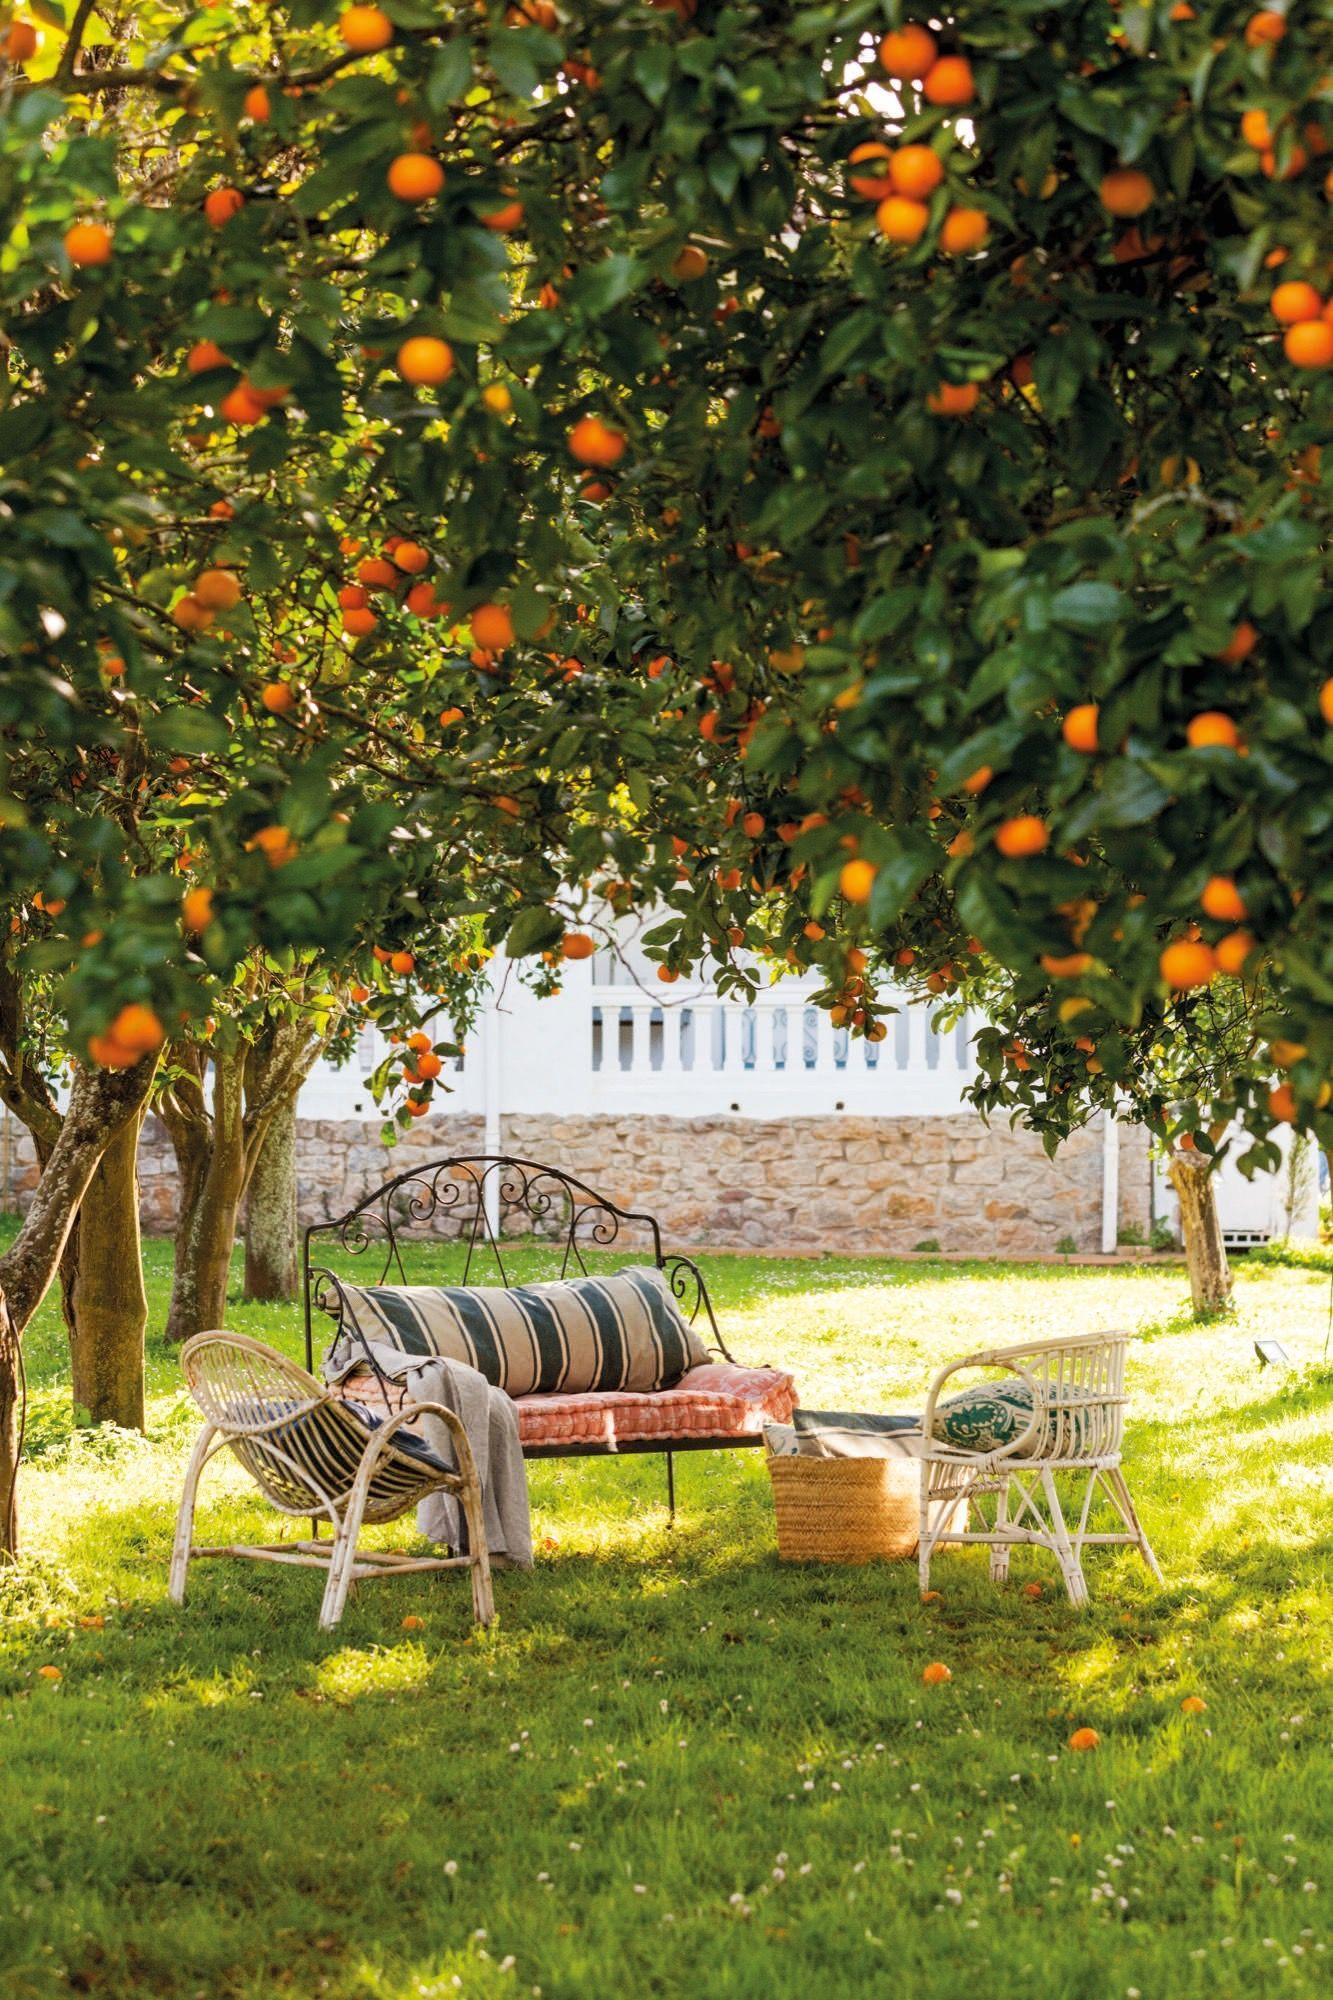 Nikon Muebles De Jardin - Muebles De Jardin Bajo Los Arboles En Casa De Federica Co [mjhdah]https://i.ebayimg.com/images/i/253012284662-0-1/s-l1000.jpg